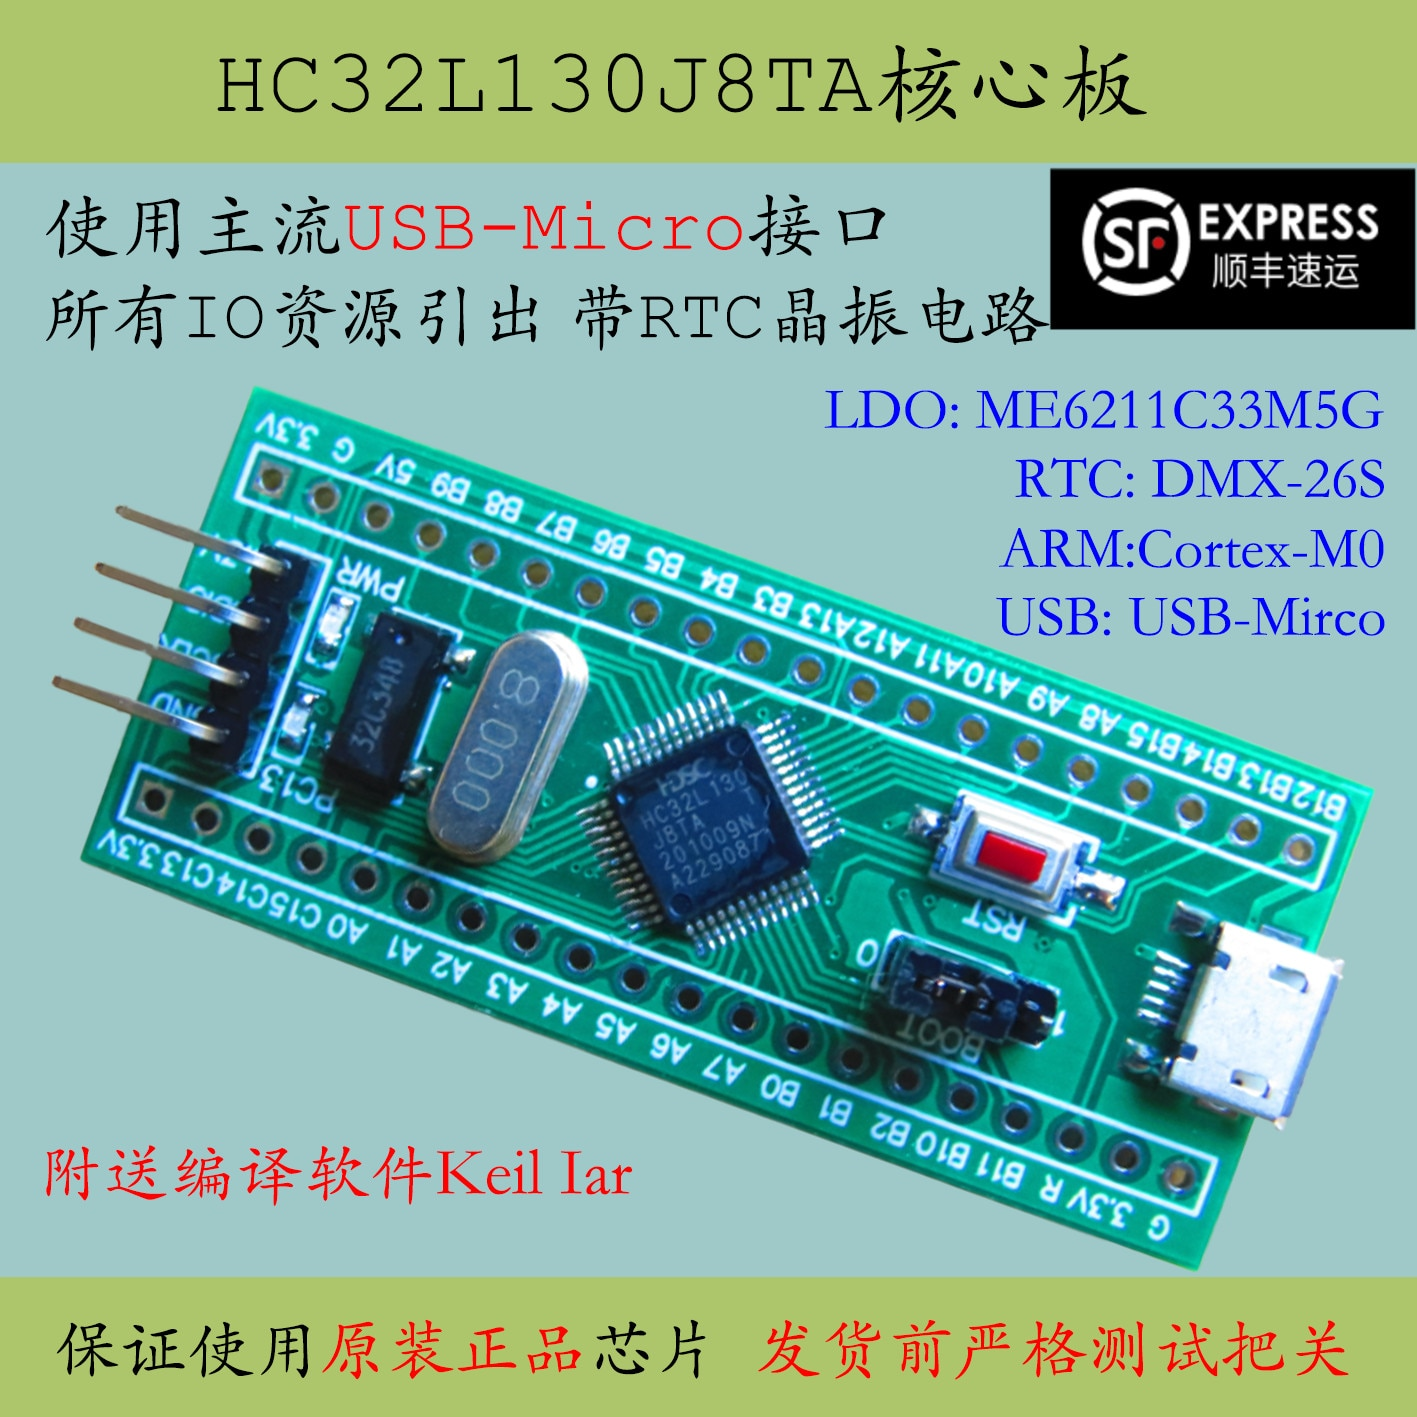 Hc32l130j8ta الأساسية المجلس Huada HDSC الحد الأدنى لنظام تطوير المنتجات الجديدة يحل محل stm32l051c8t6